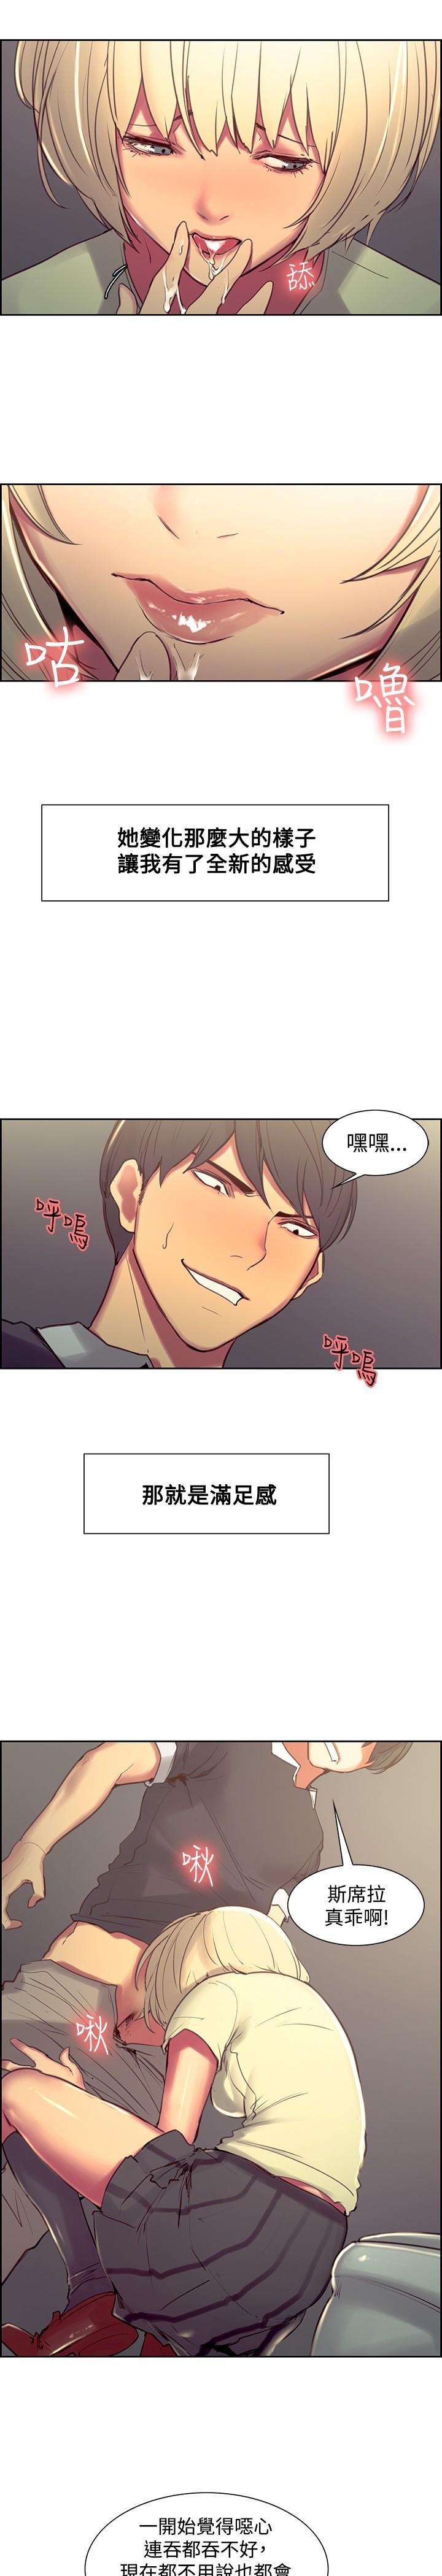 Domesticate the Housekeeper 调教家政妇 ch.29-30 22